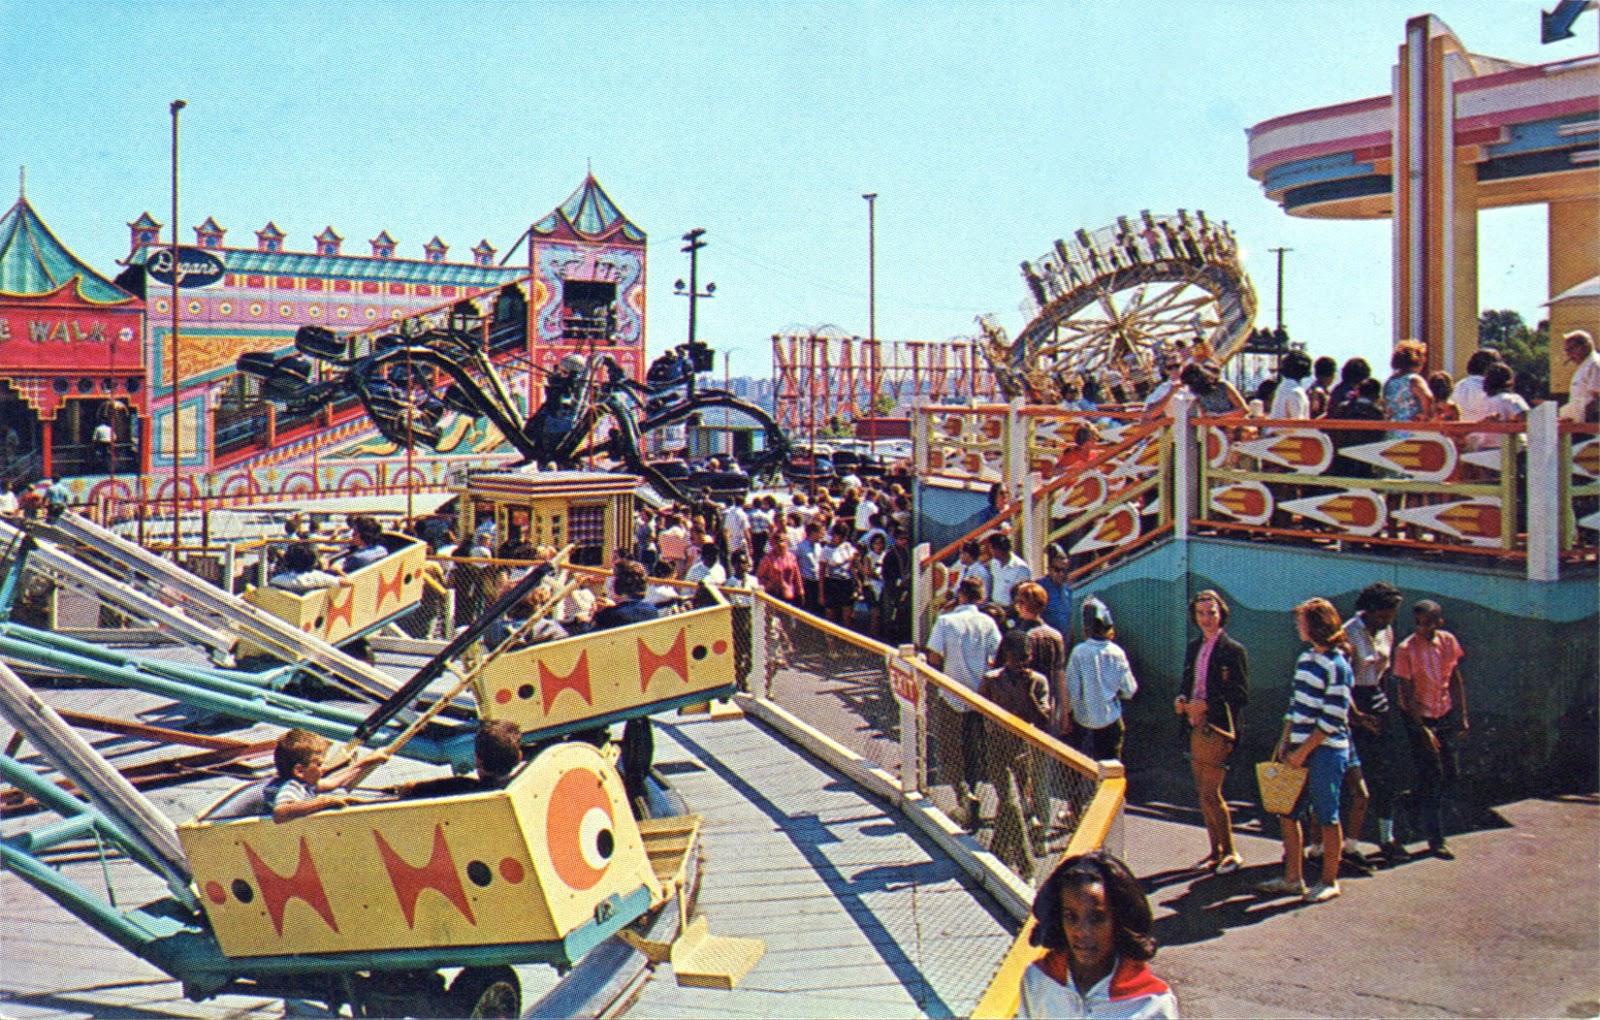 Palisades amusement park midway new jersey